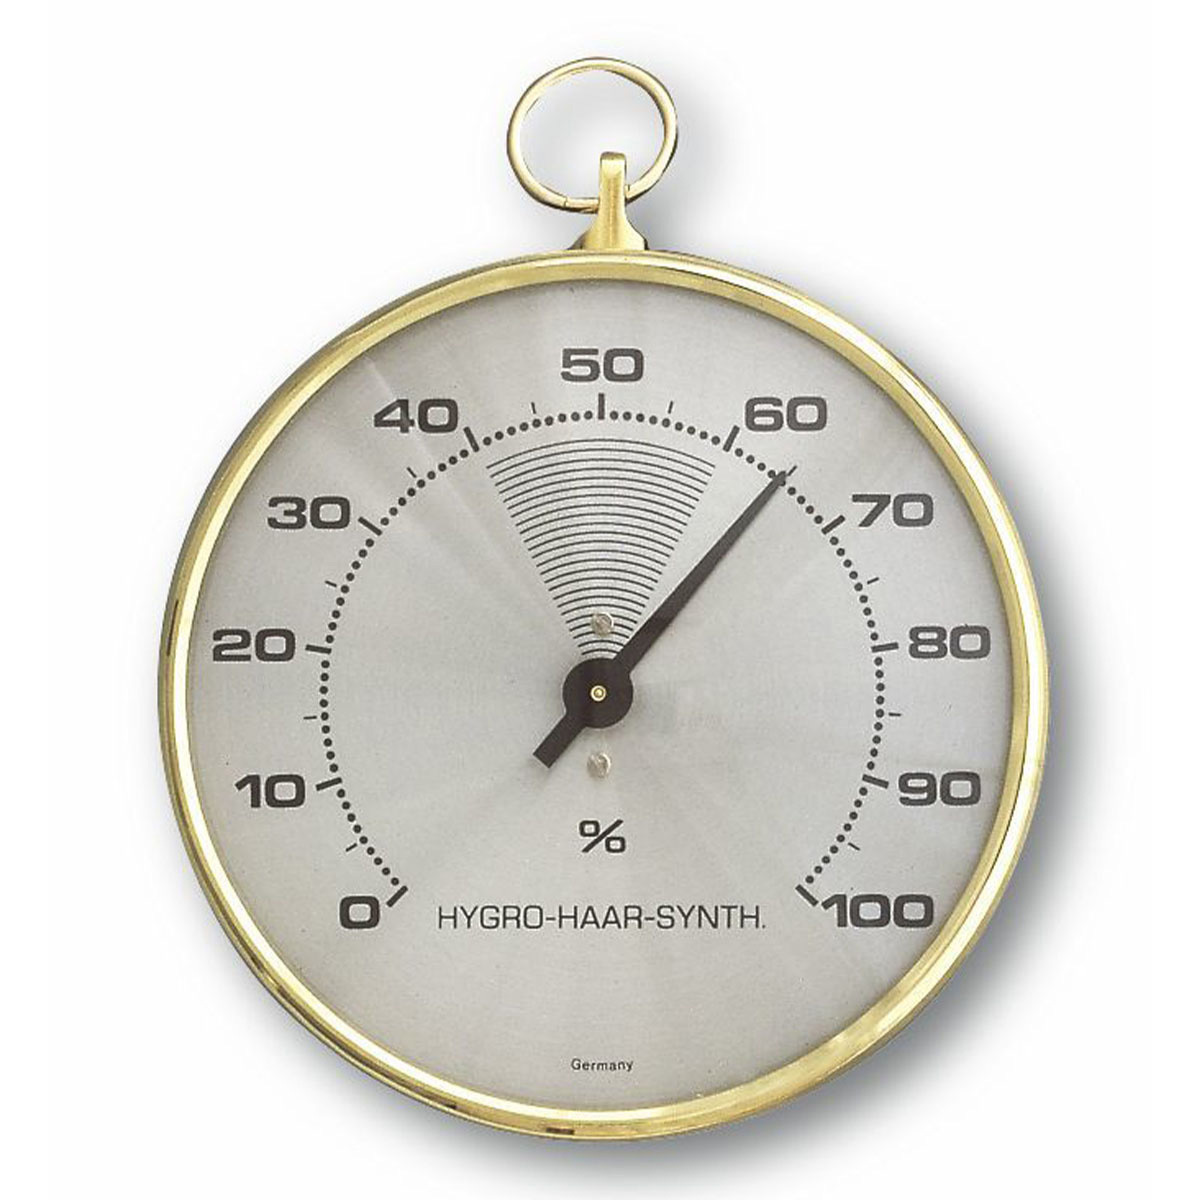 44-2001-analoges-hygrometer-mit-messingring-1200x1200px.jpg